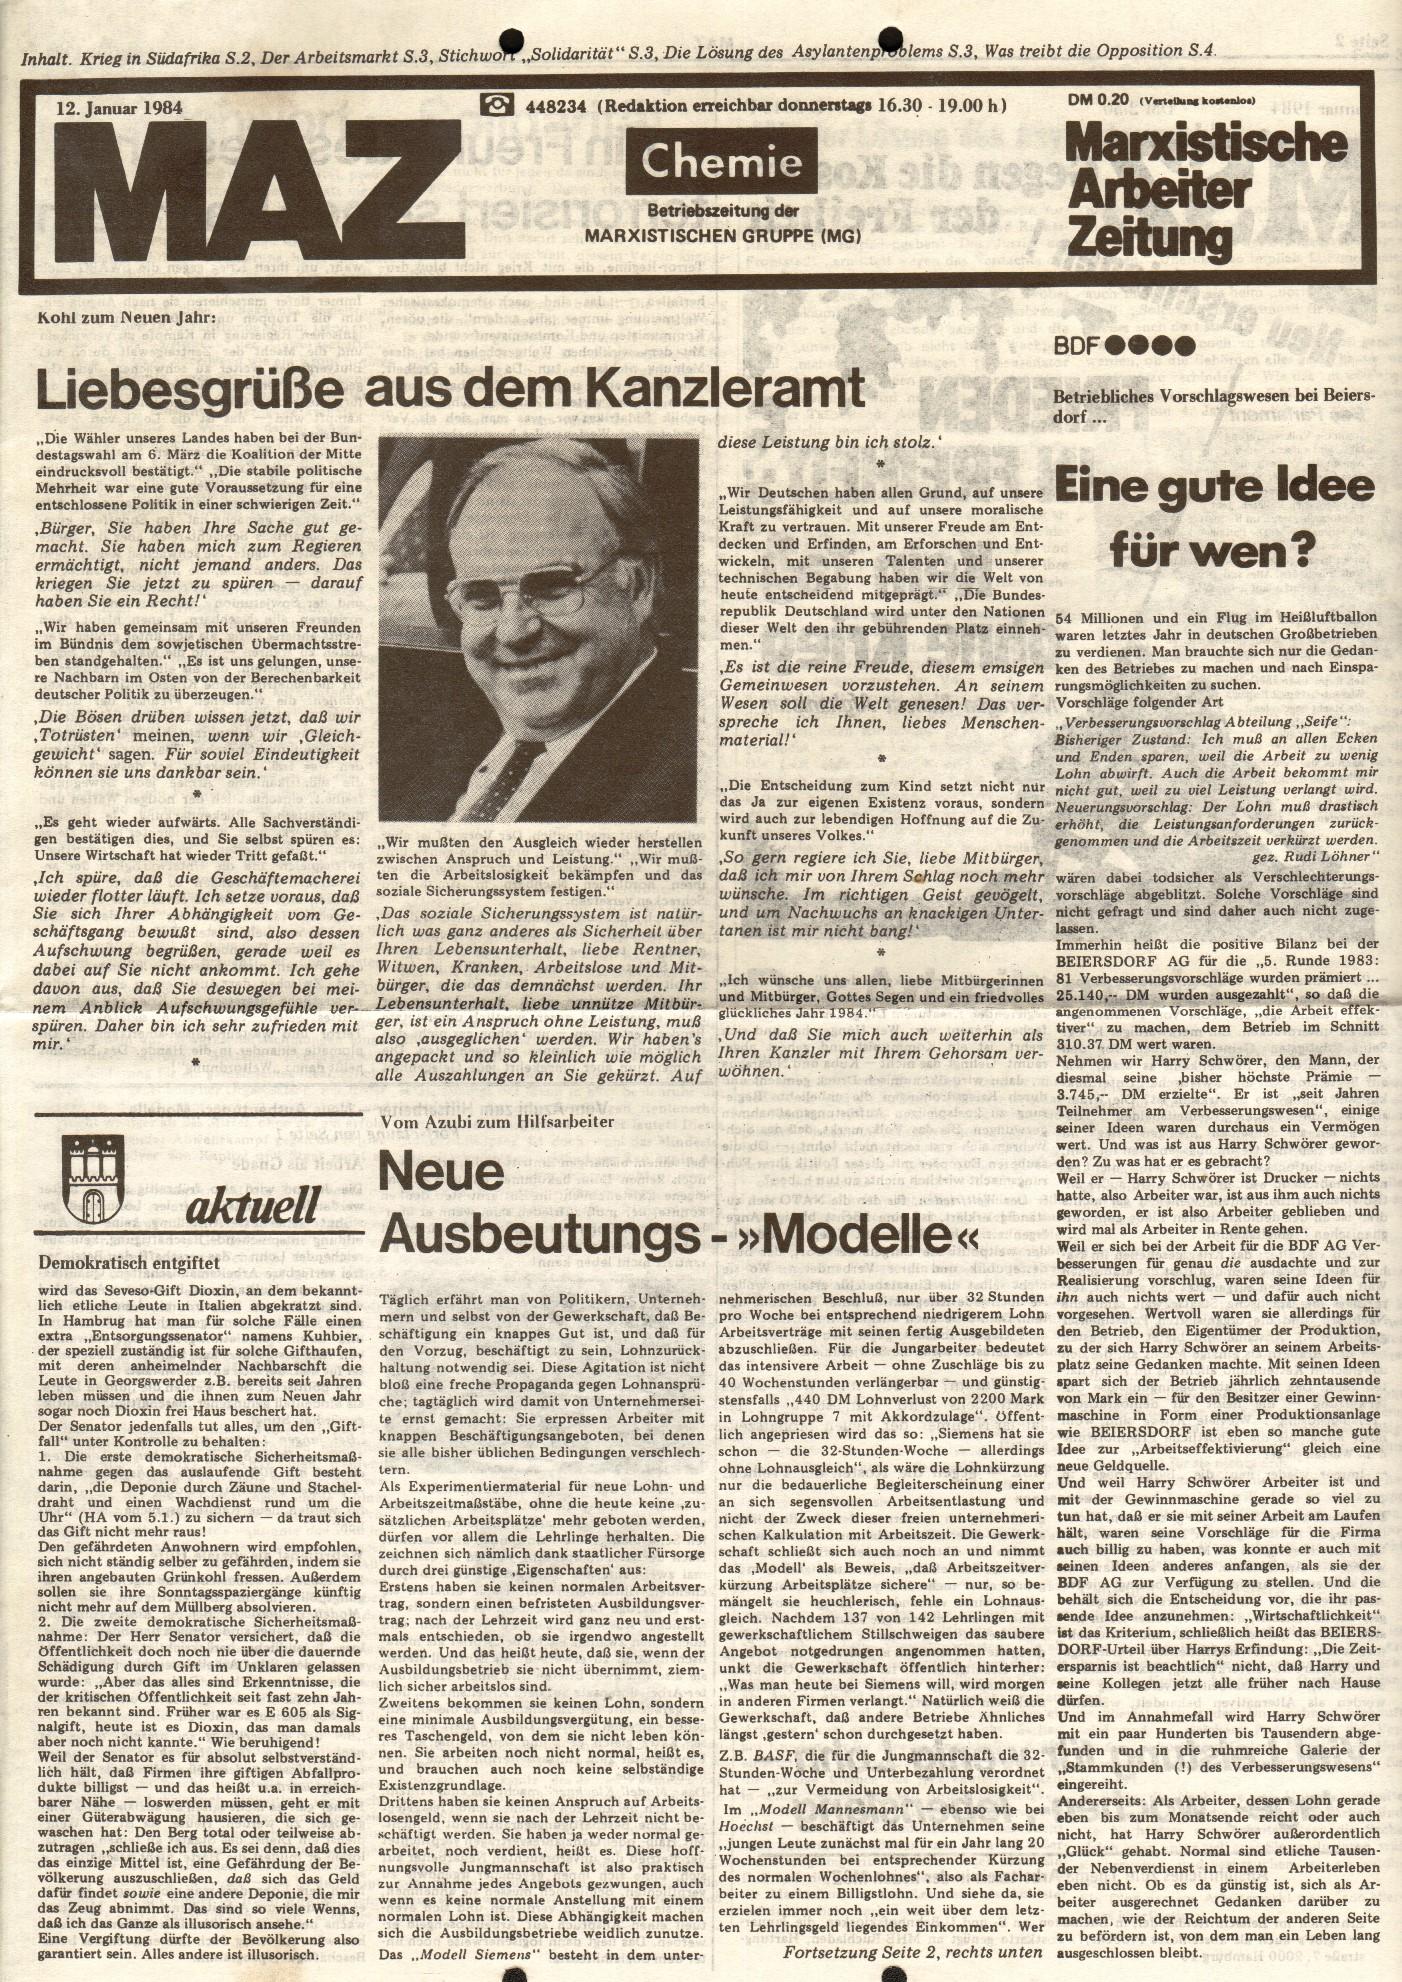 Hamburg_MG_MAZ_Chemie_19840112_01